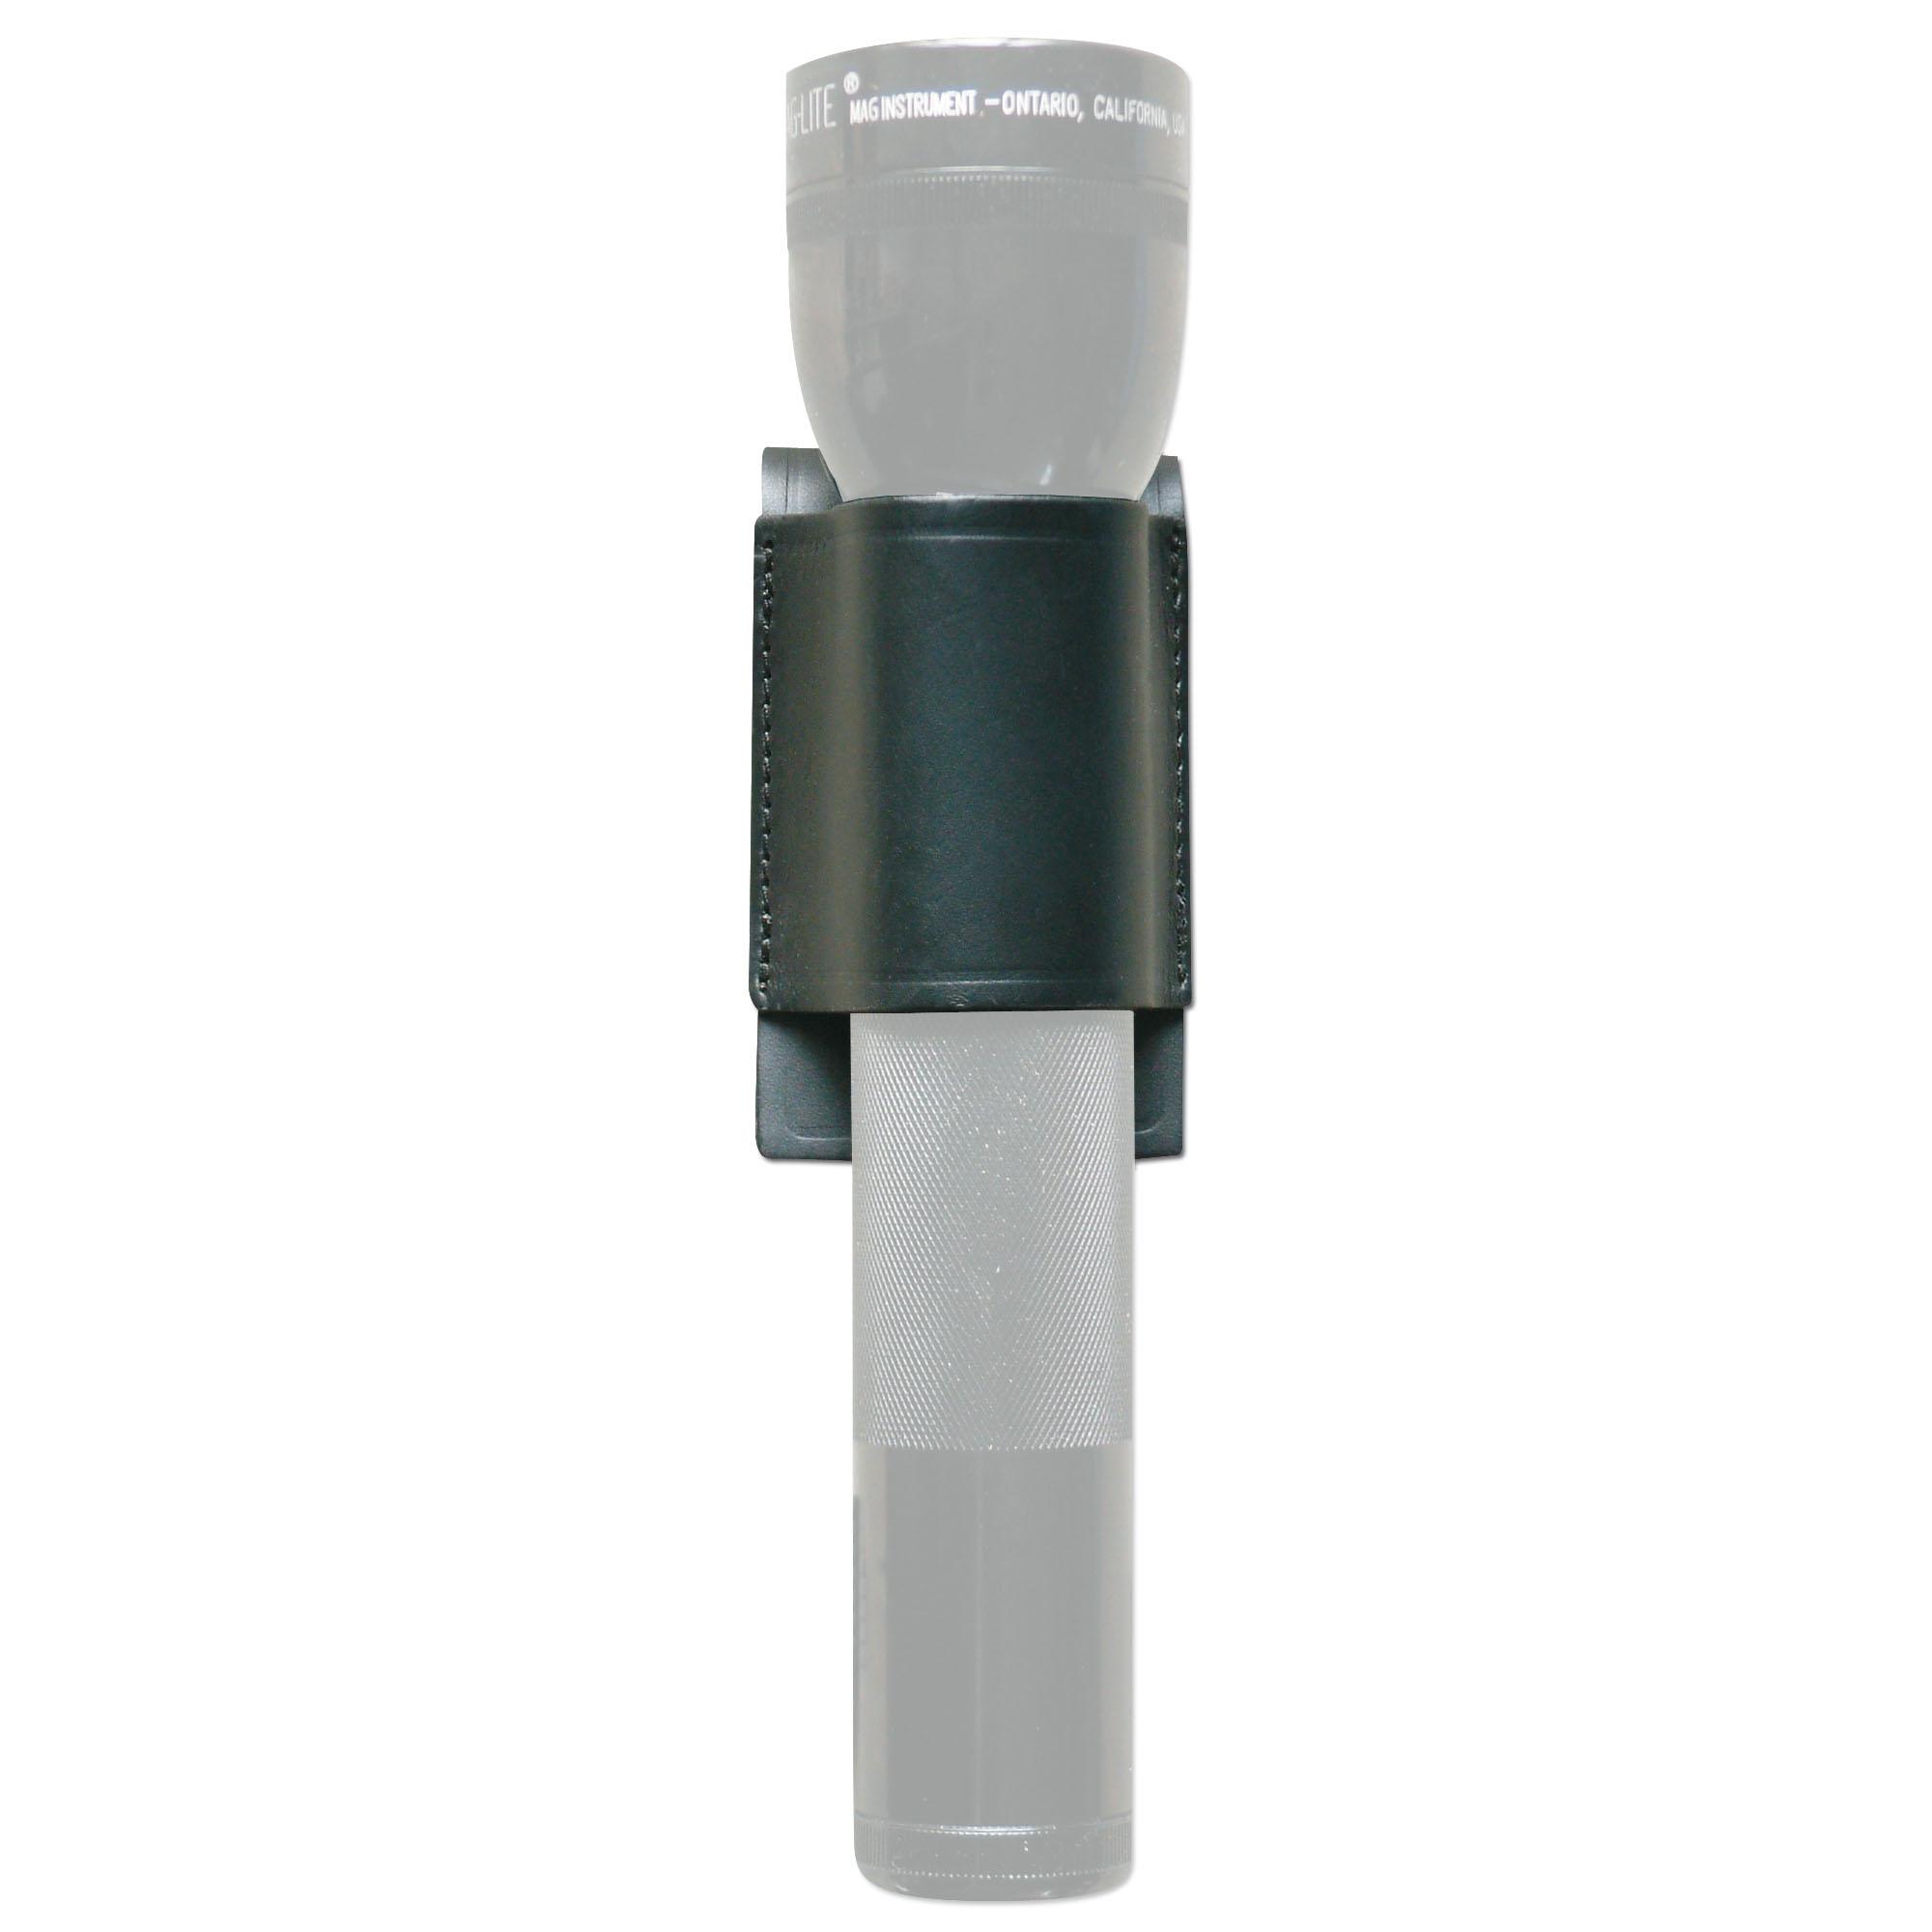 Gürtelschlaufe Leder für D-Cell Lampen